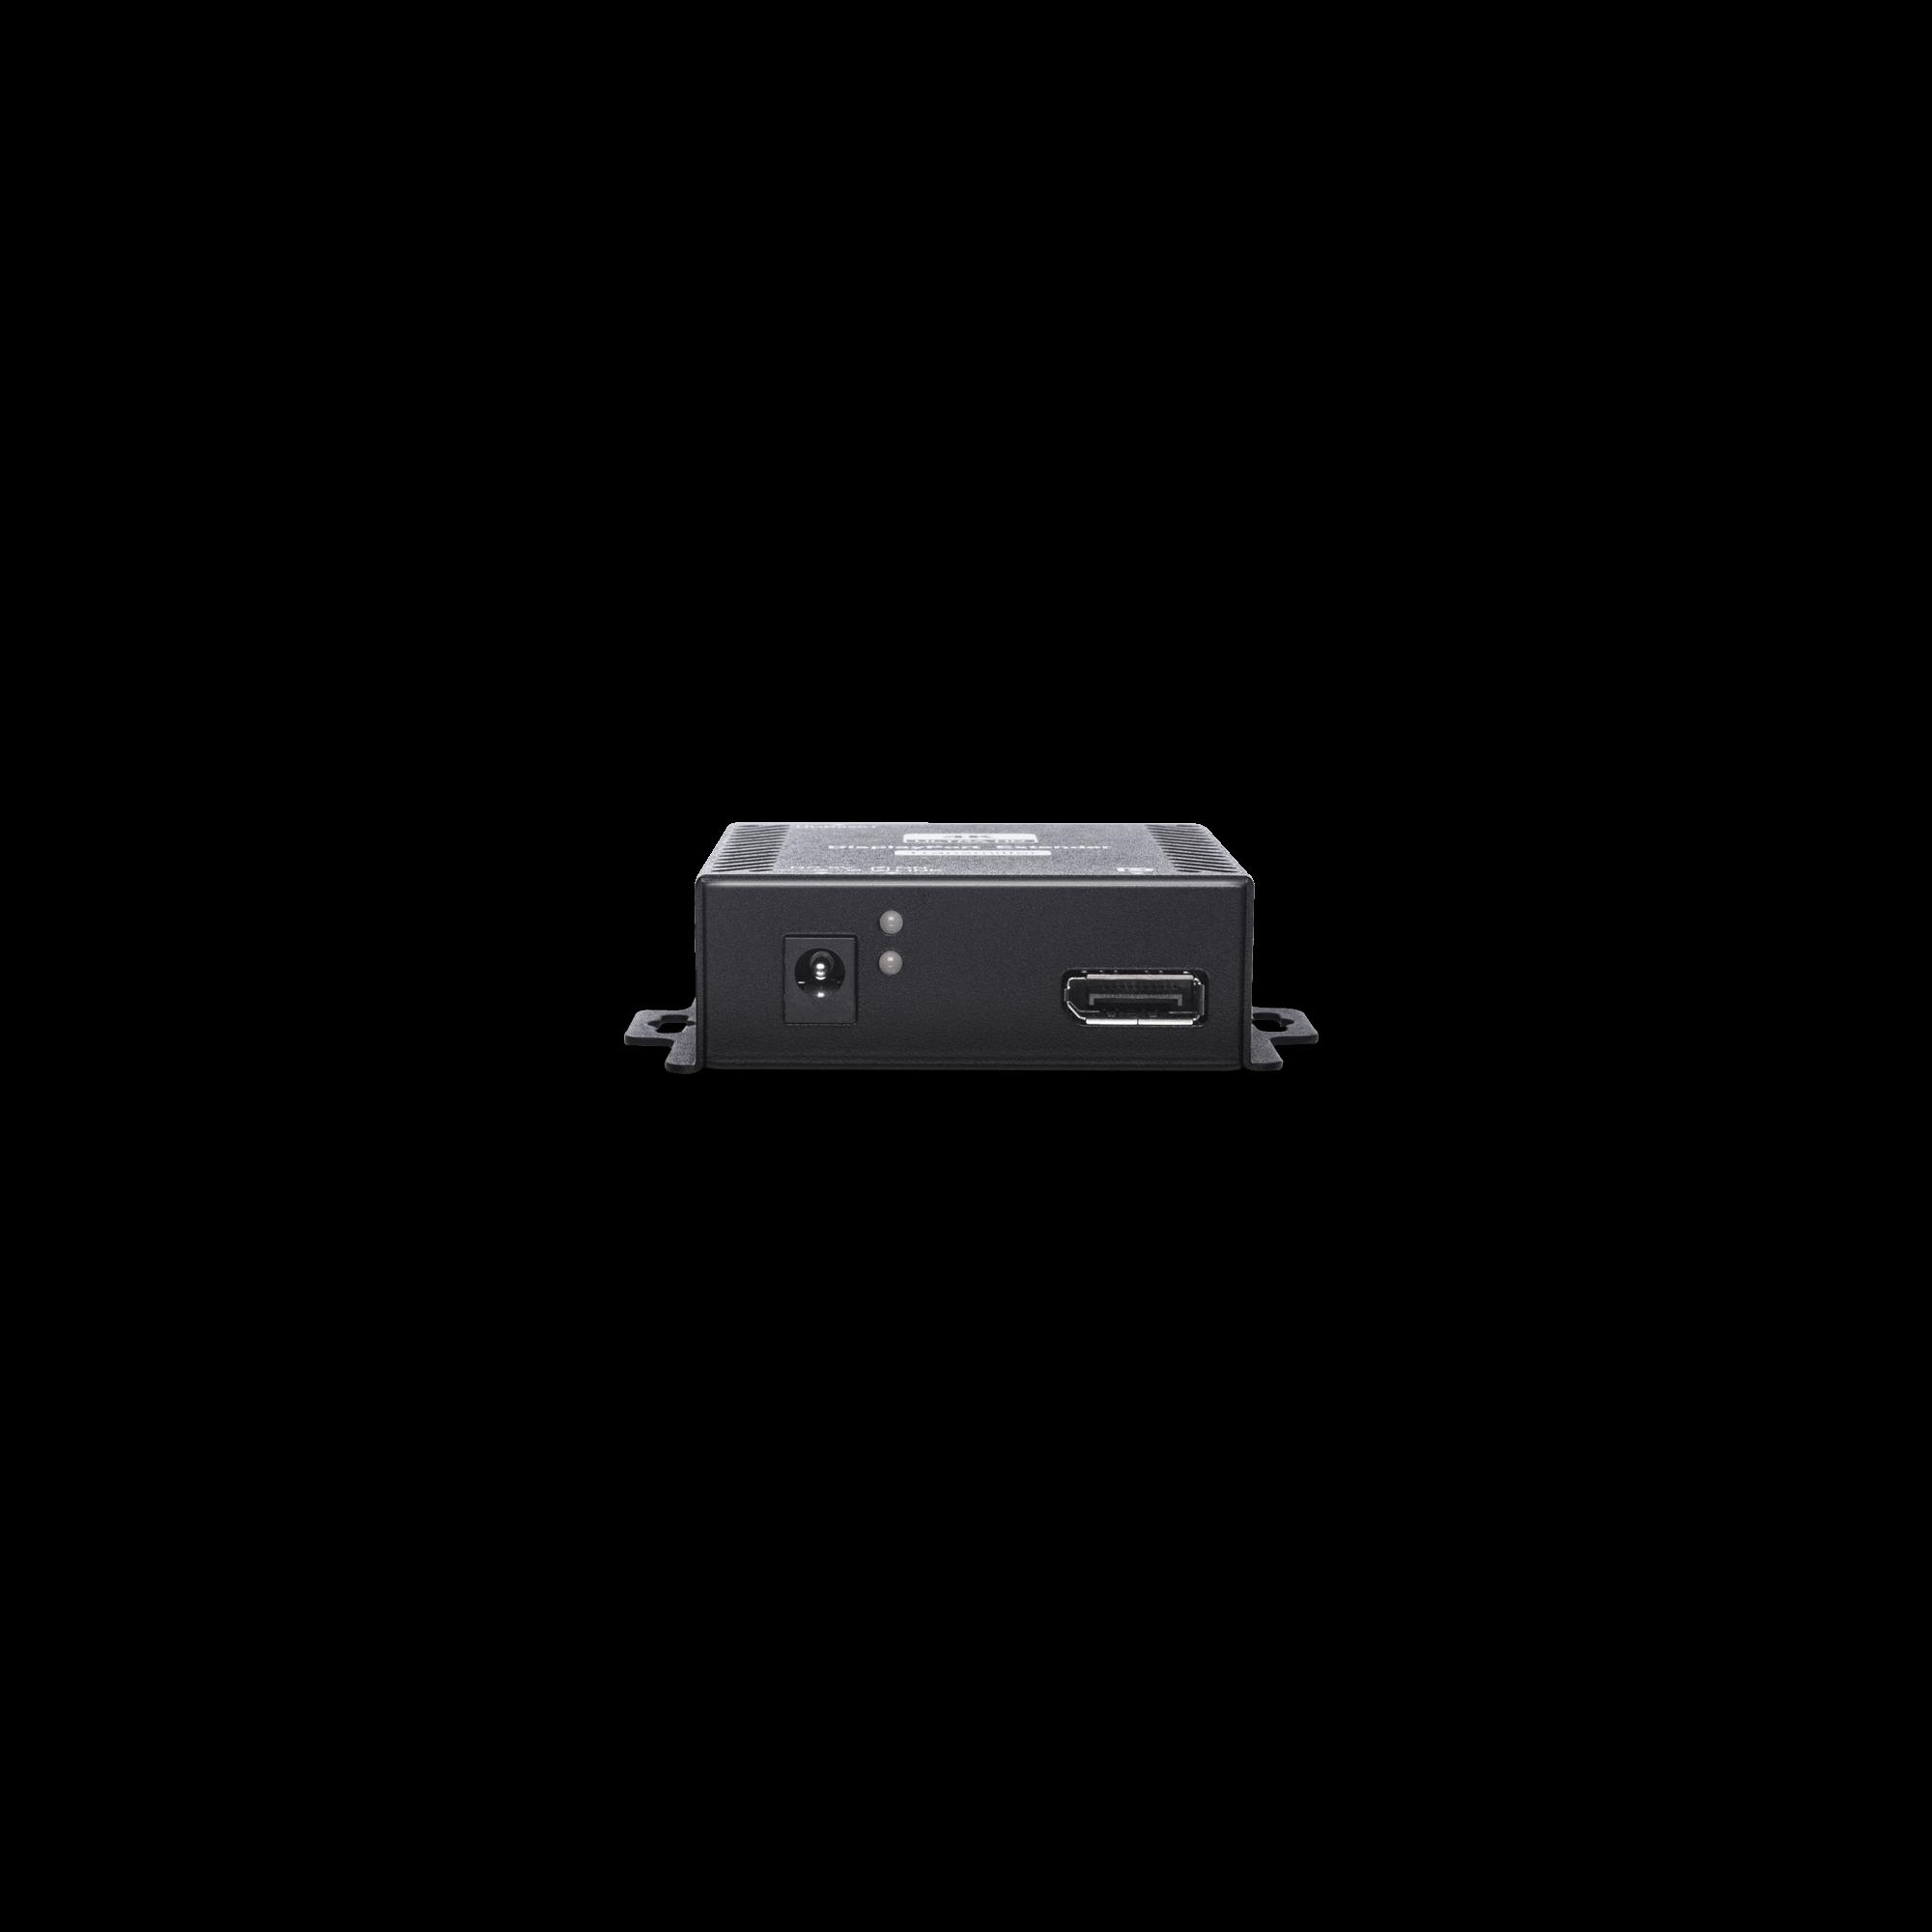 4K DisplayPort CAT5e Extender 70M